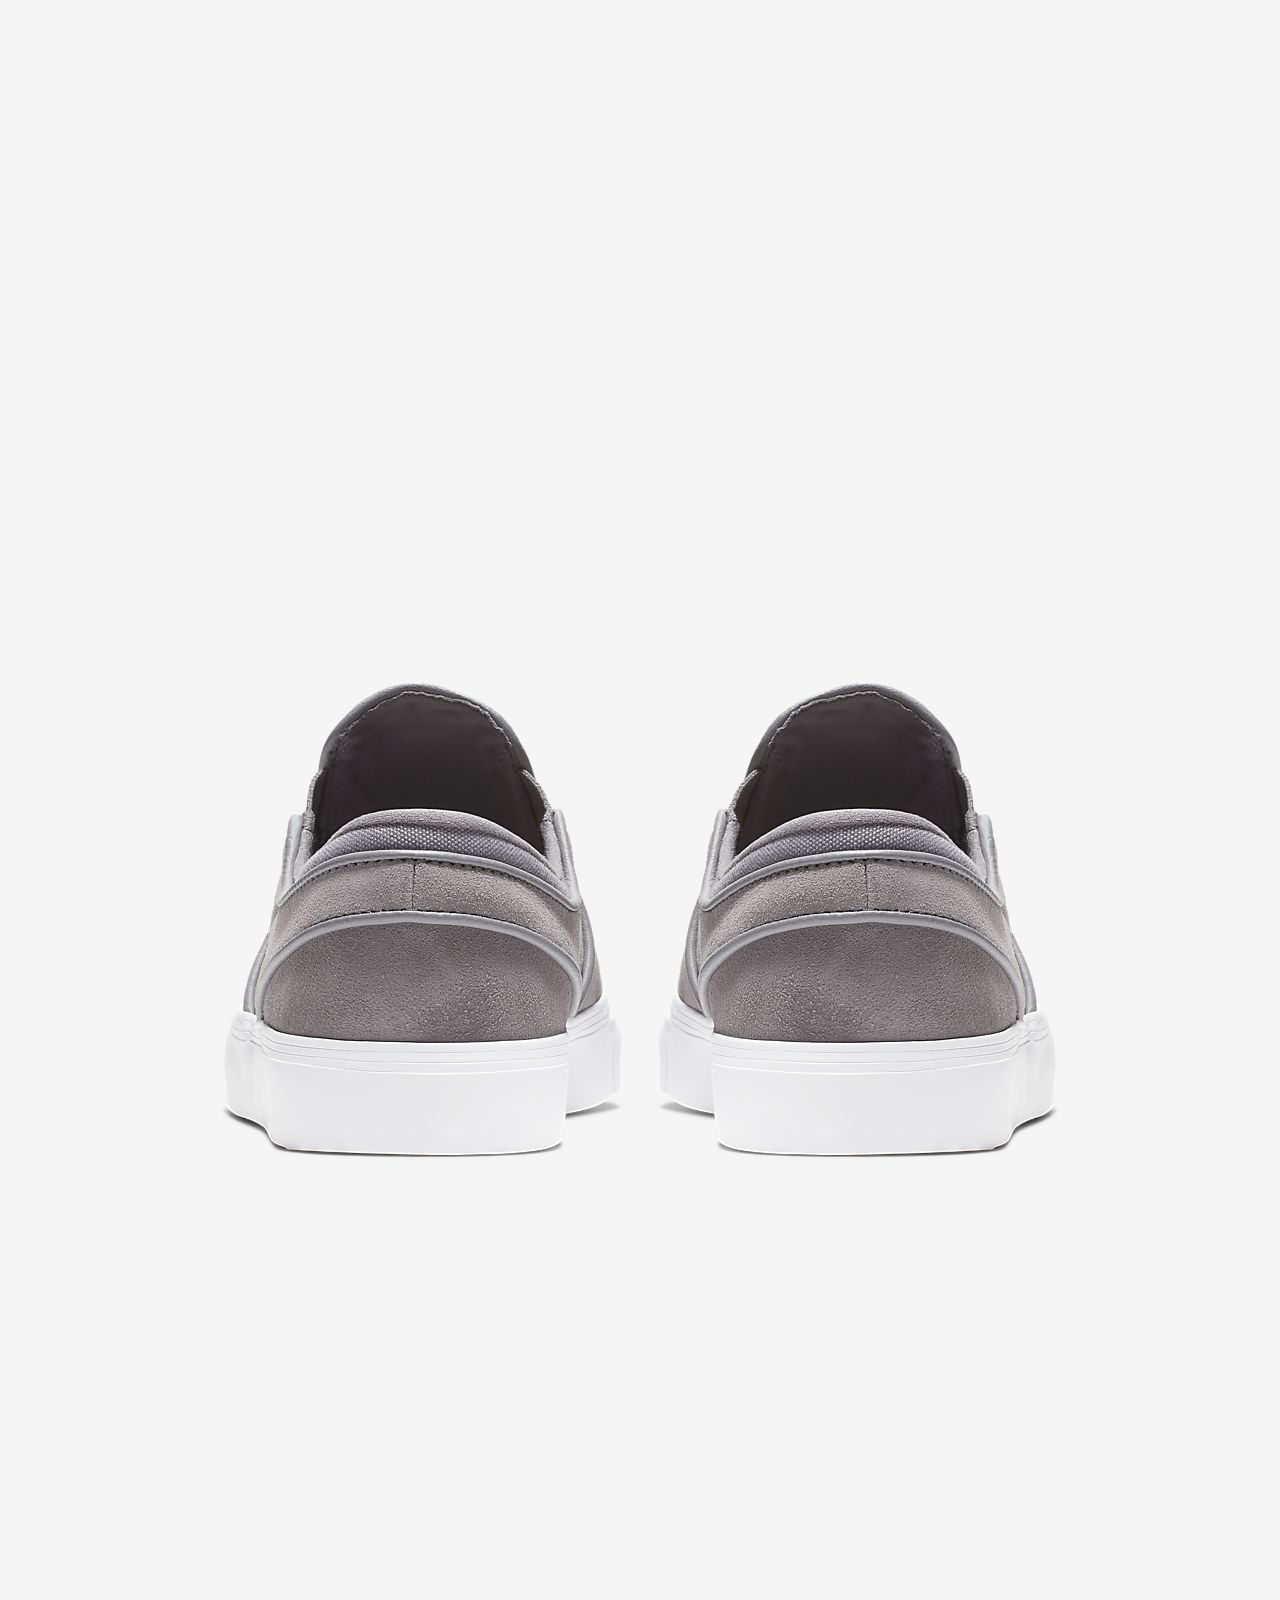 online retailer 653fd f9c3c ... Nike SB Zoom Stefan Janoski Slip-On Men s Skateboarding Shoe